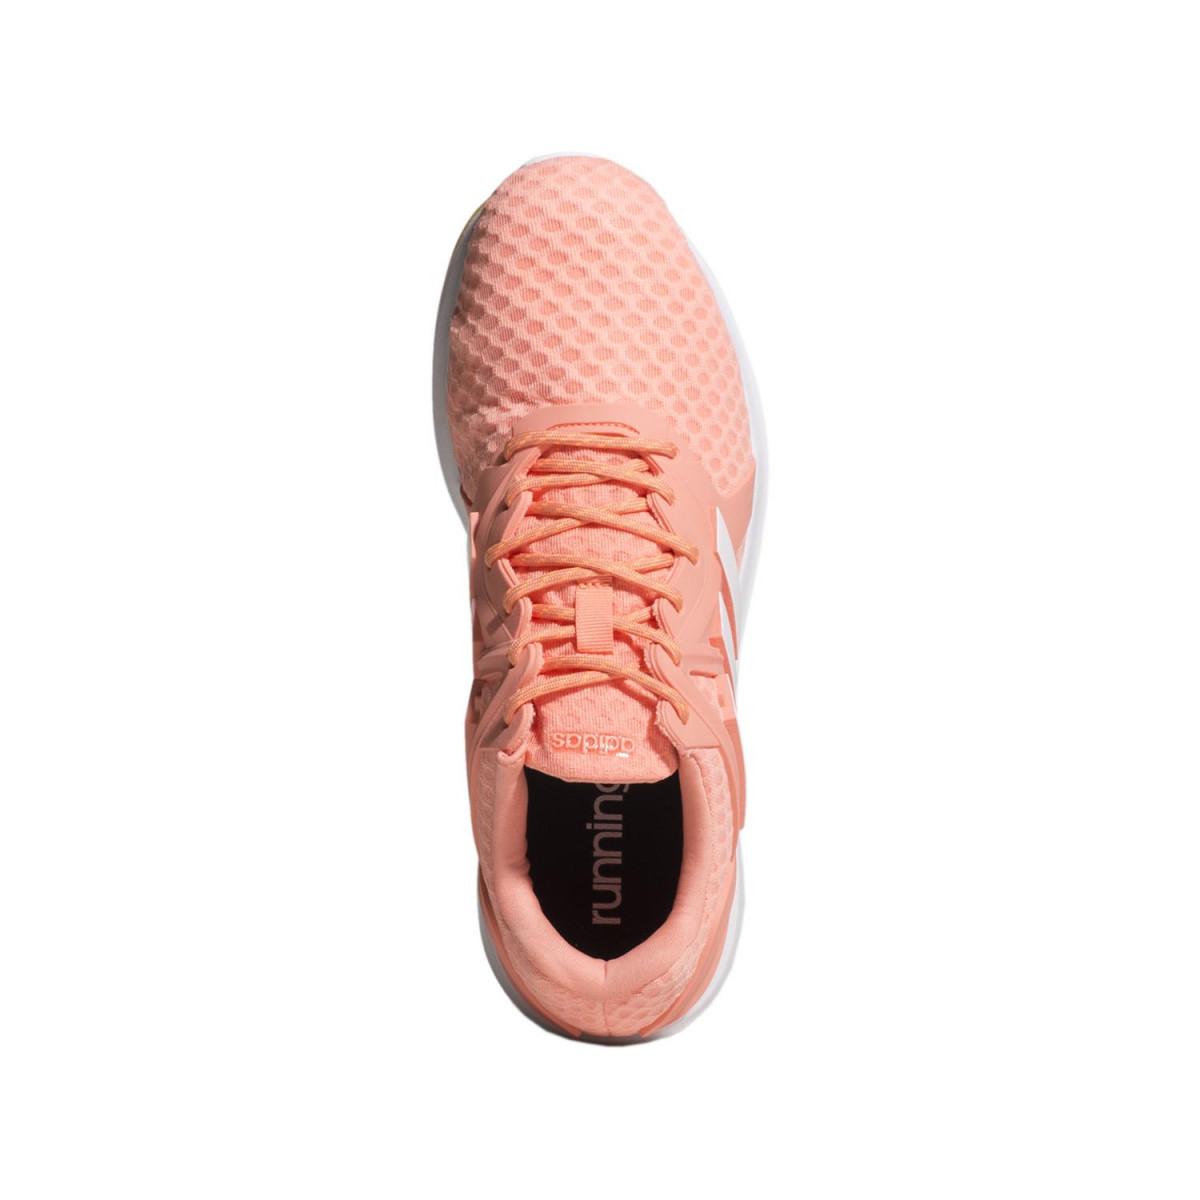 bf13beac1 Zapatillas Adidas Starlux - Running - Zapatillas - Mujer